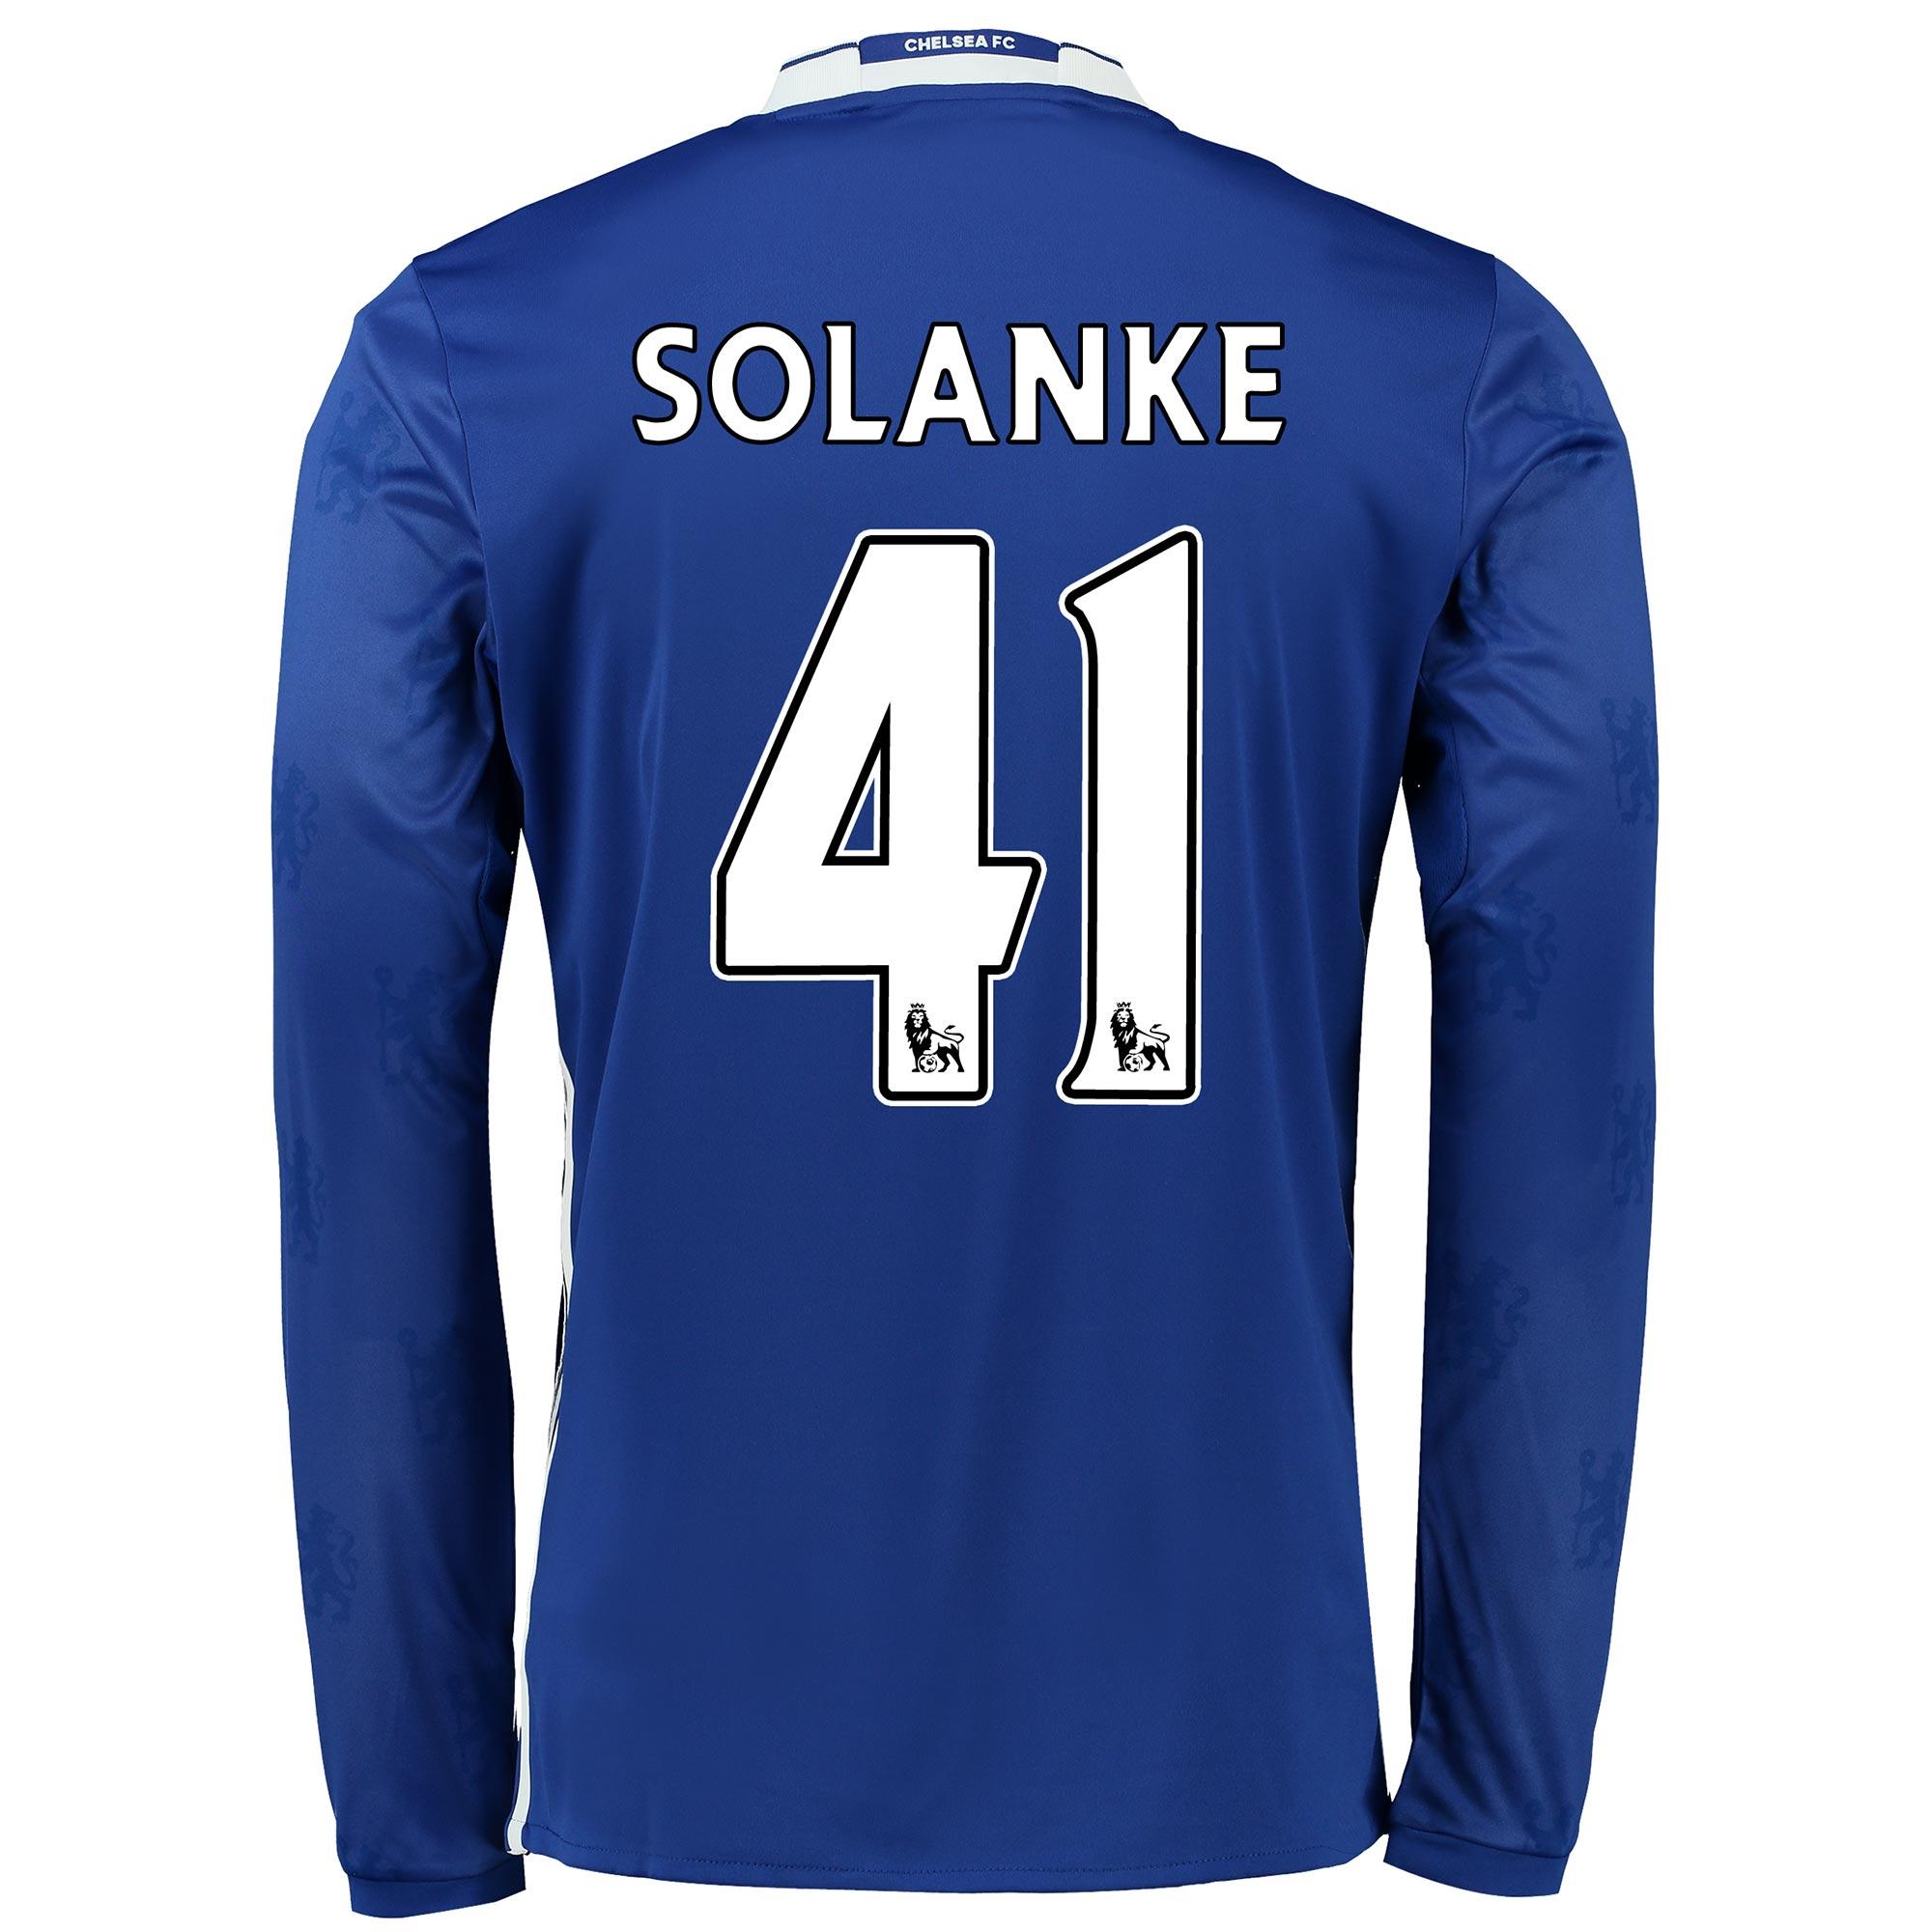 Chelsea Home Shirt 2016-17 - Kids - Long Sleeve with Solanke 41 printi